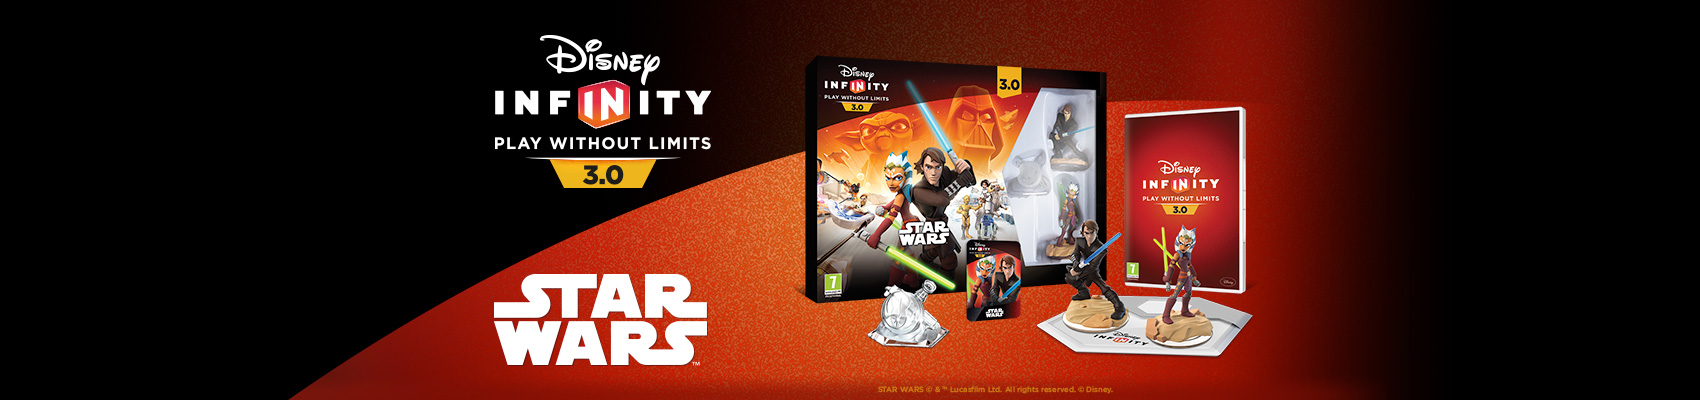 Disney Infinity 3.0 Launch Guide